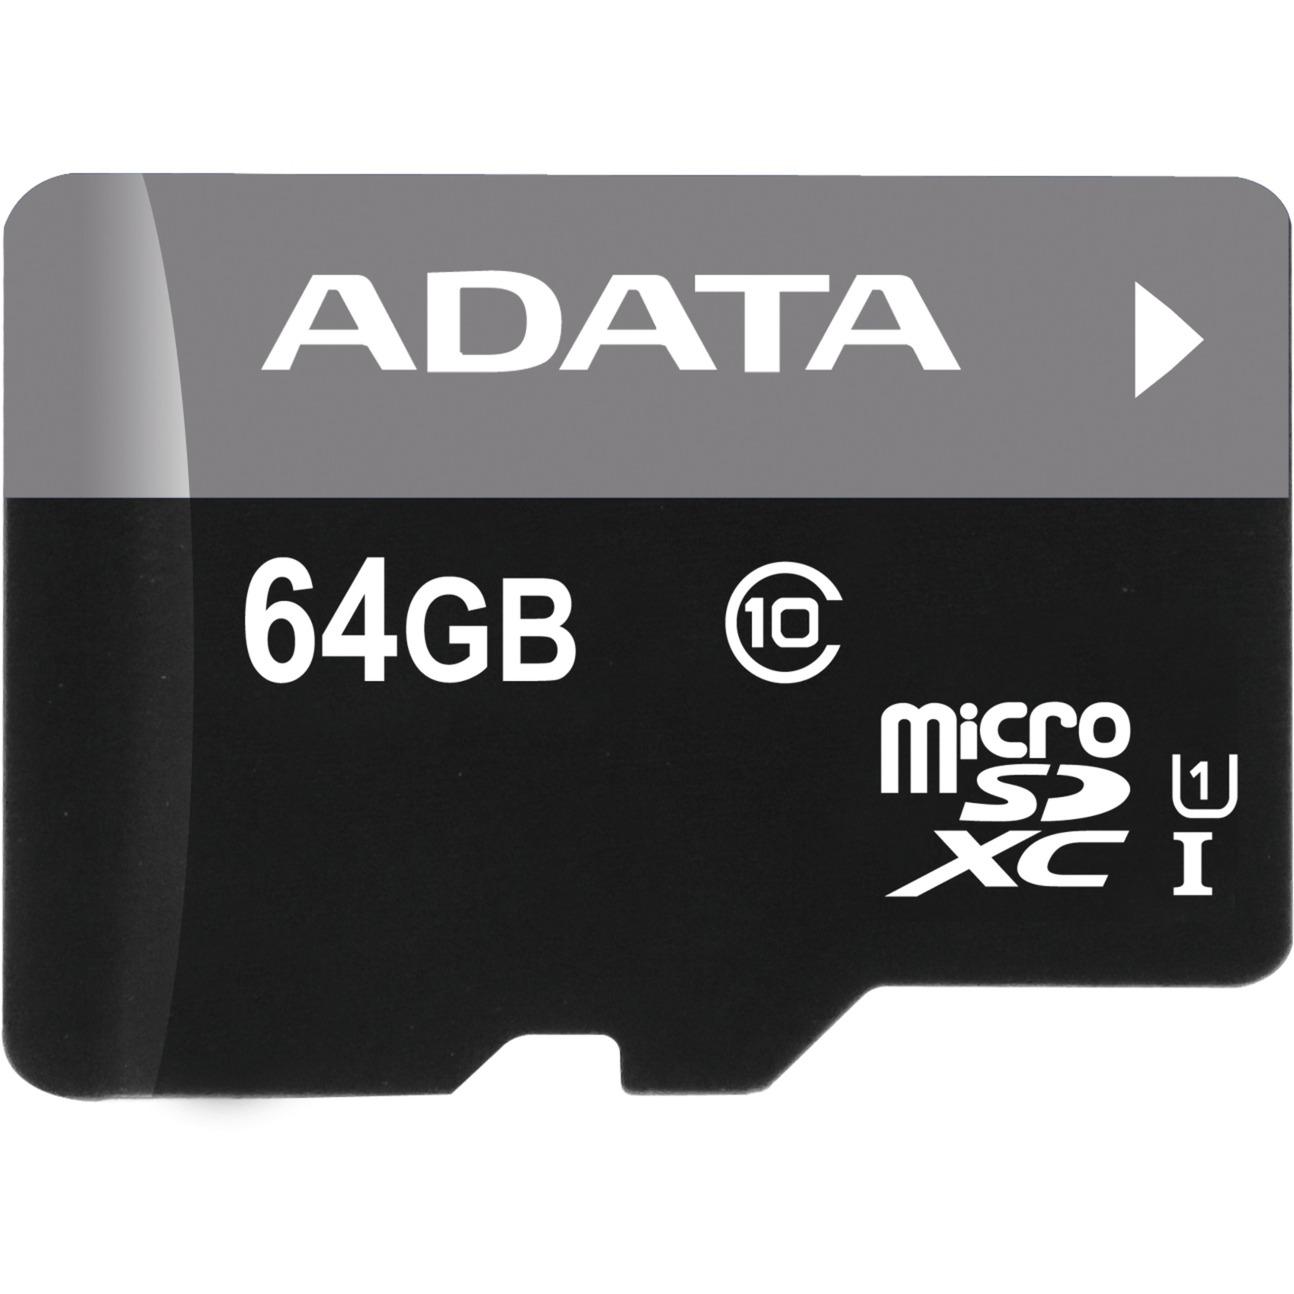 ausdx64guicl10-r-hukommelseskort